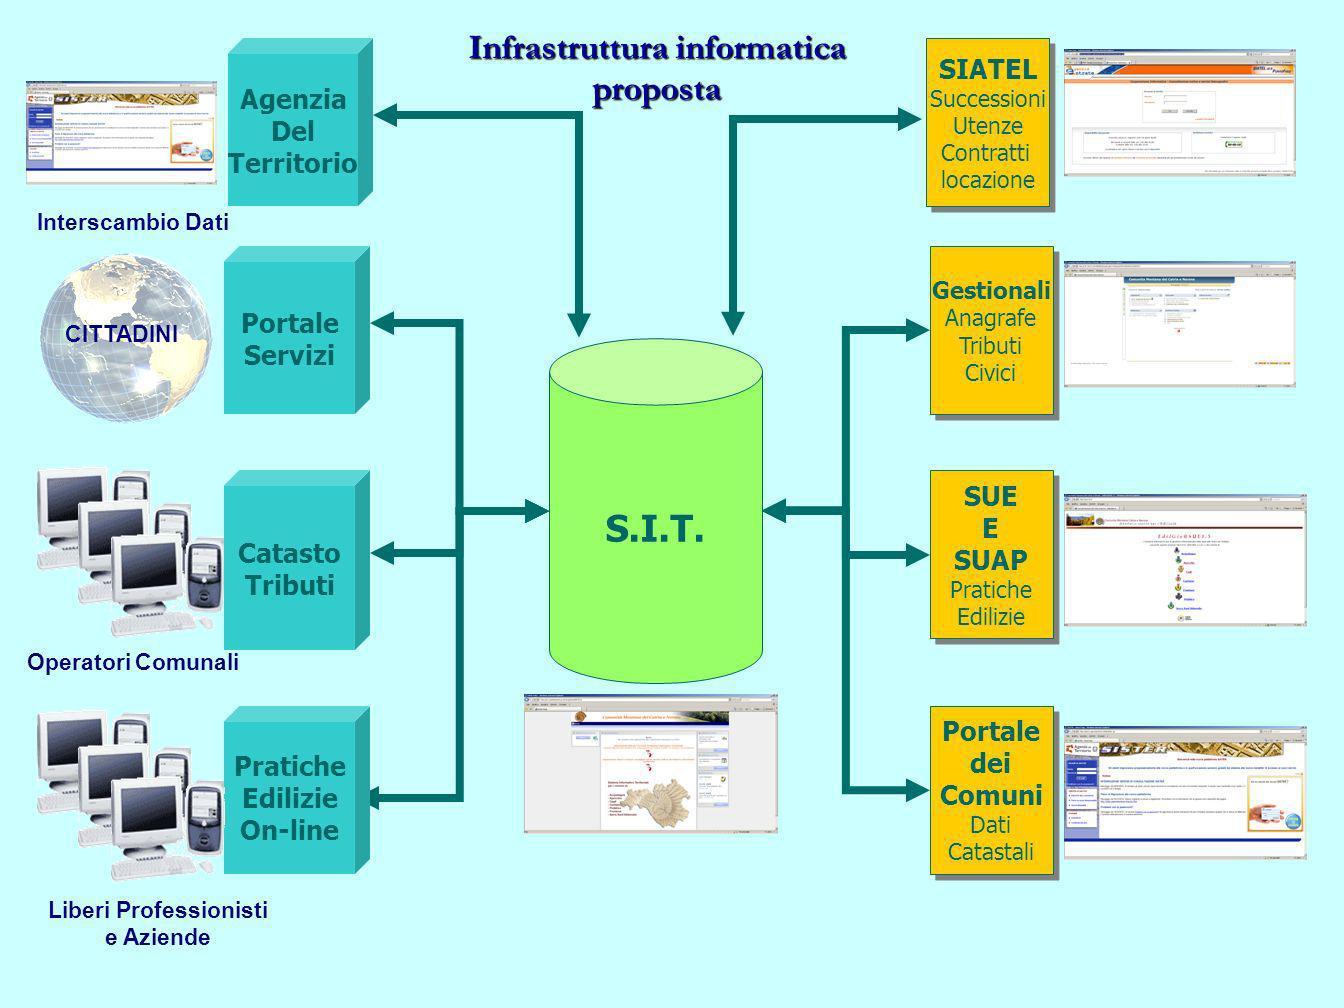 Infrastruttura informatica proposta